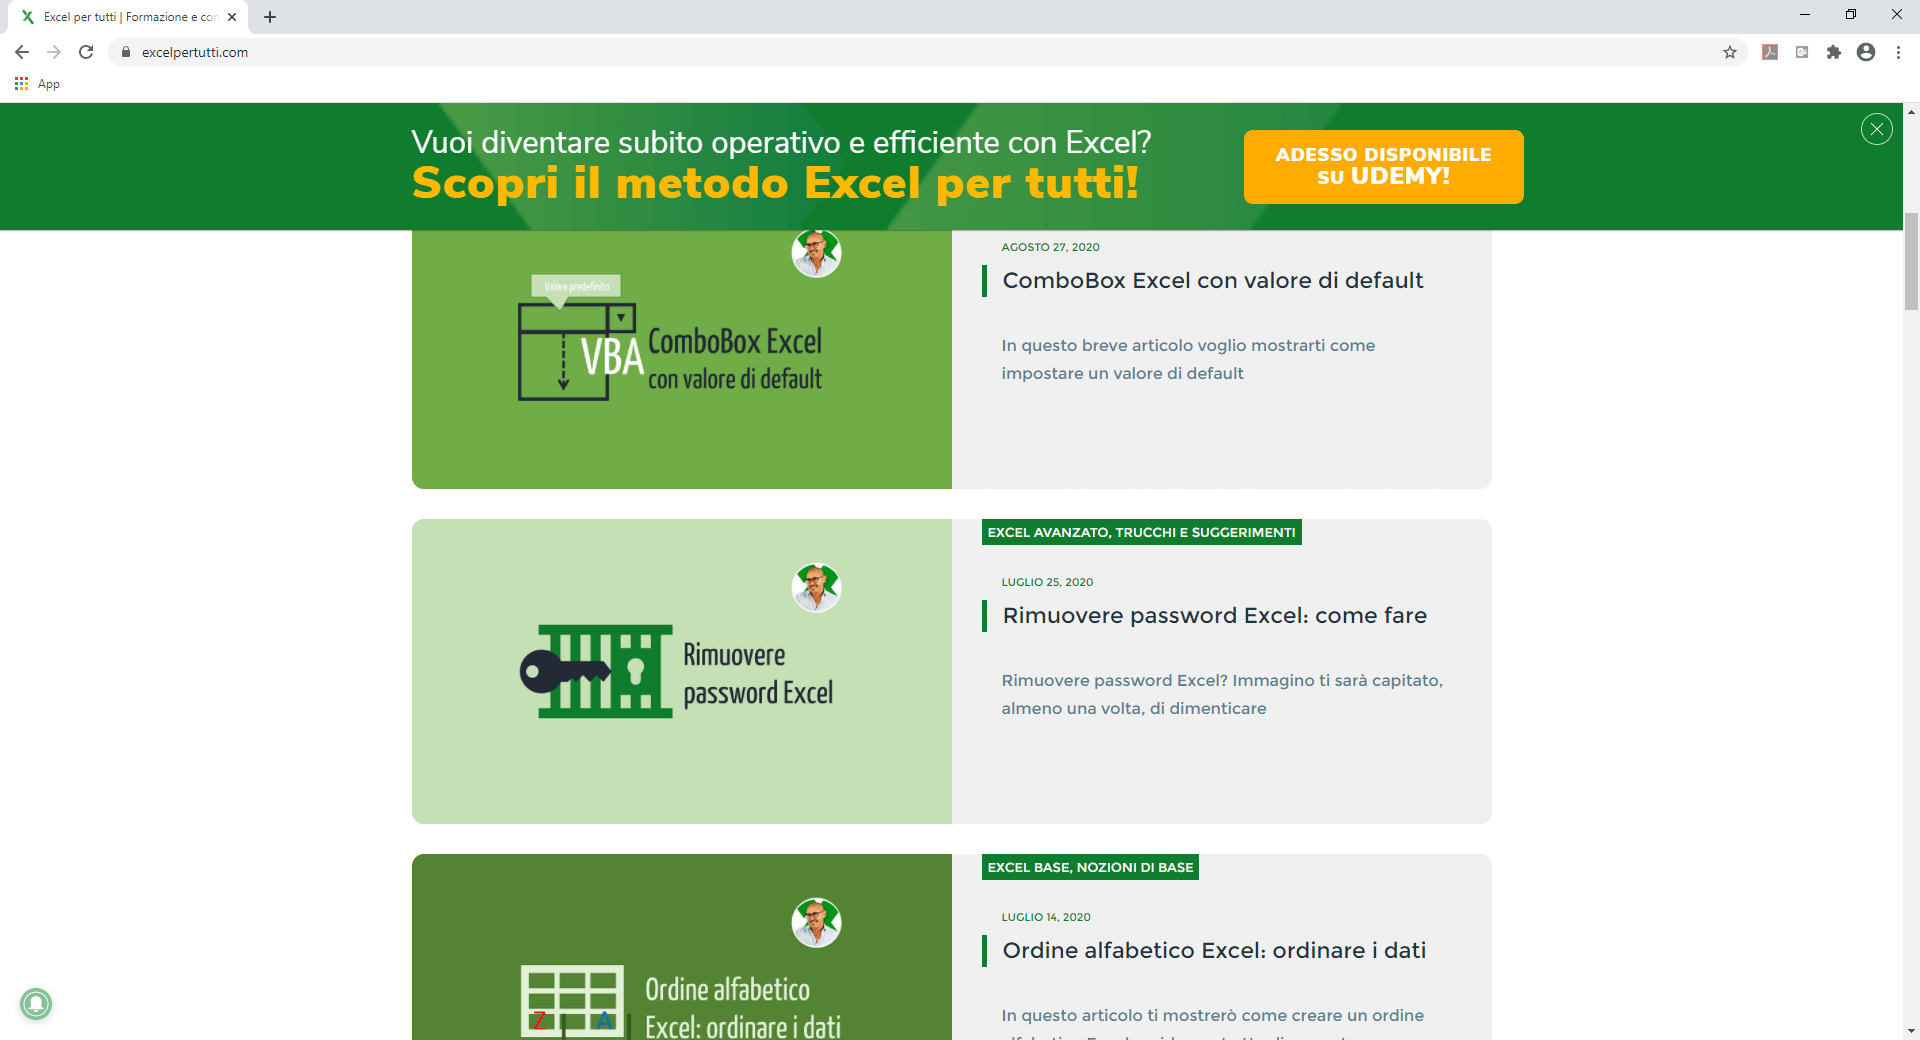 Guida Excel | Corso di Excel | Imparare Excel